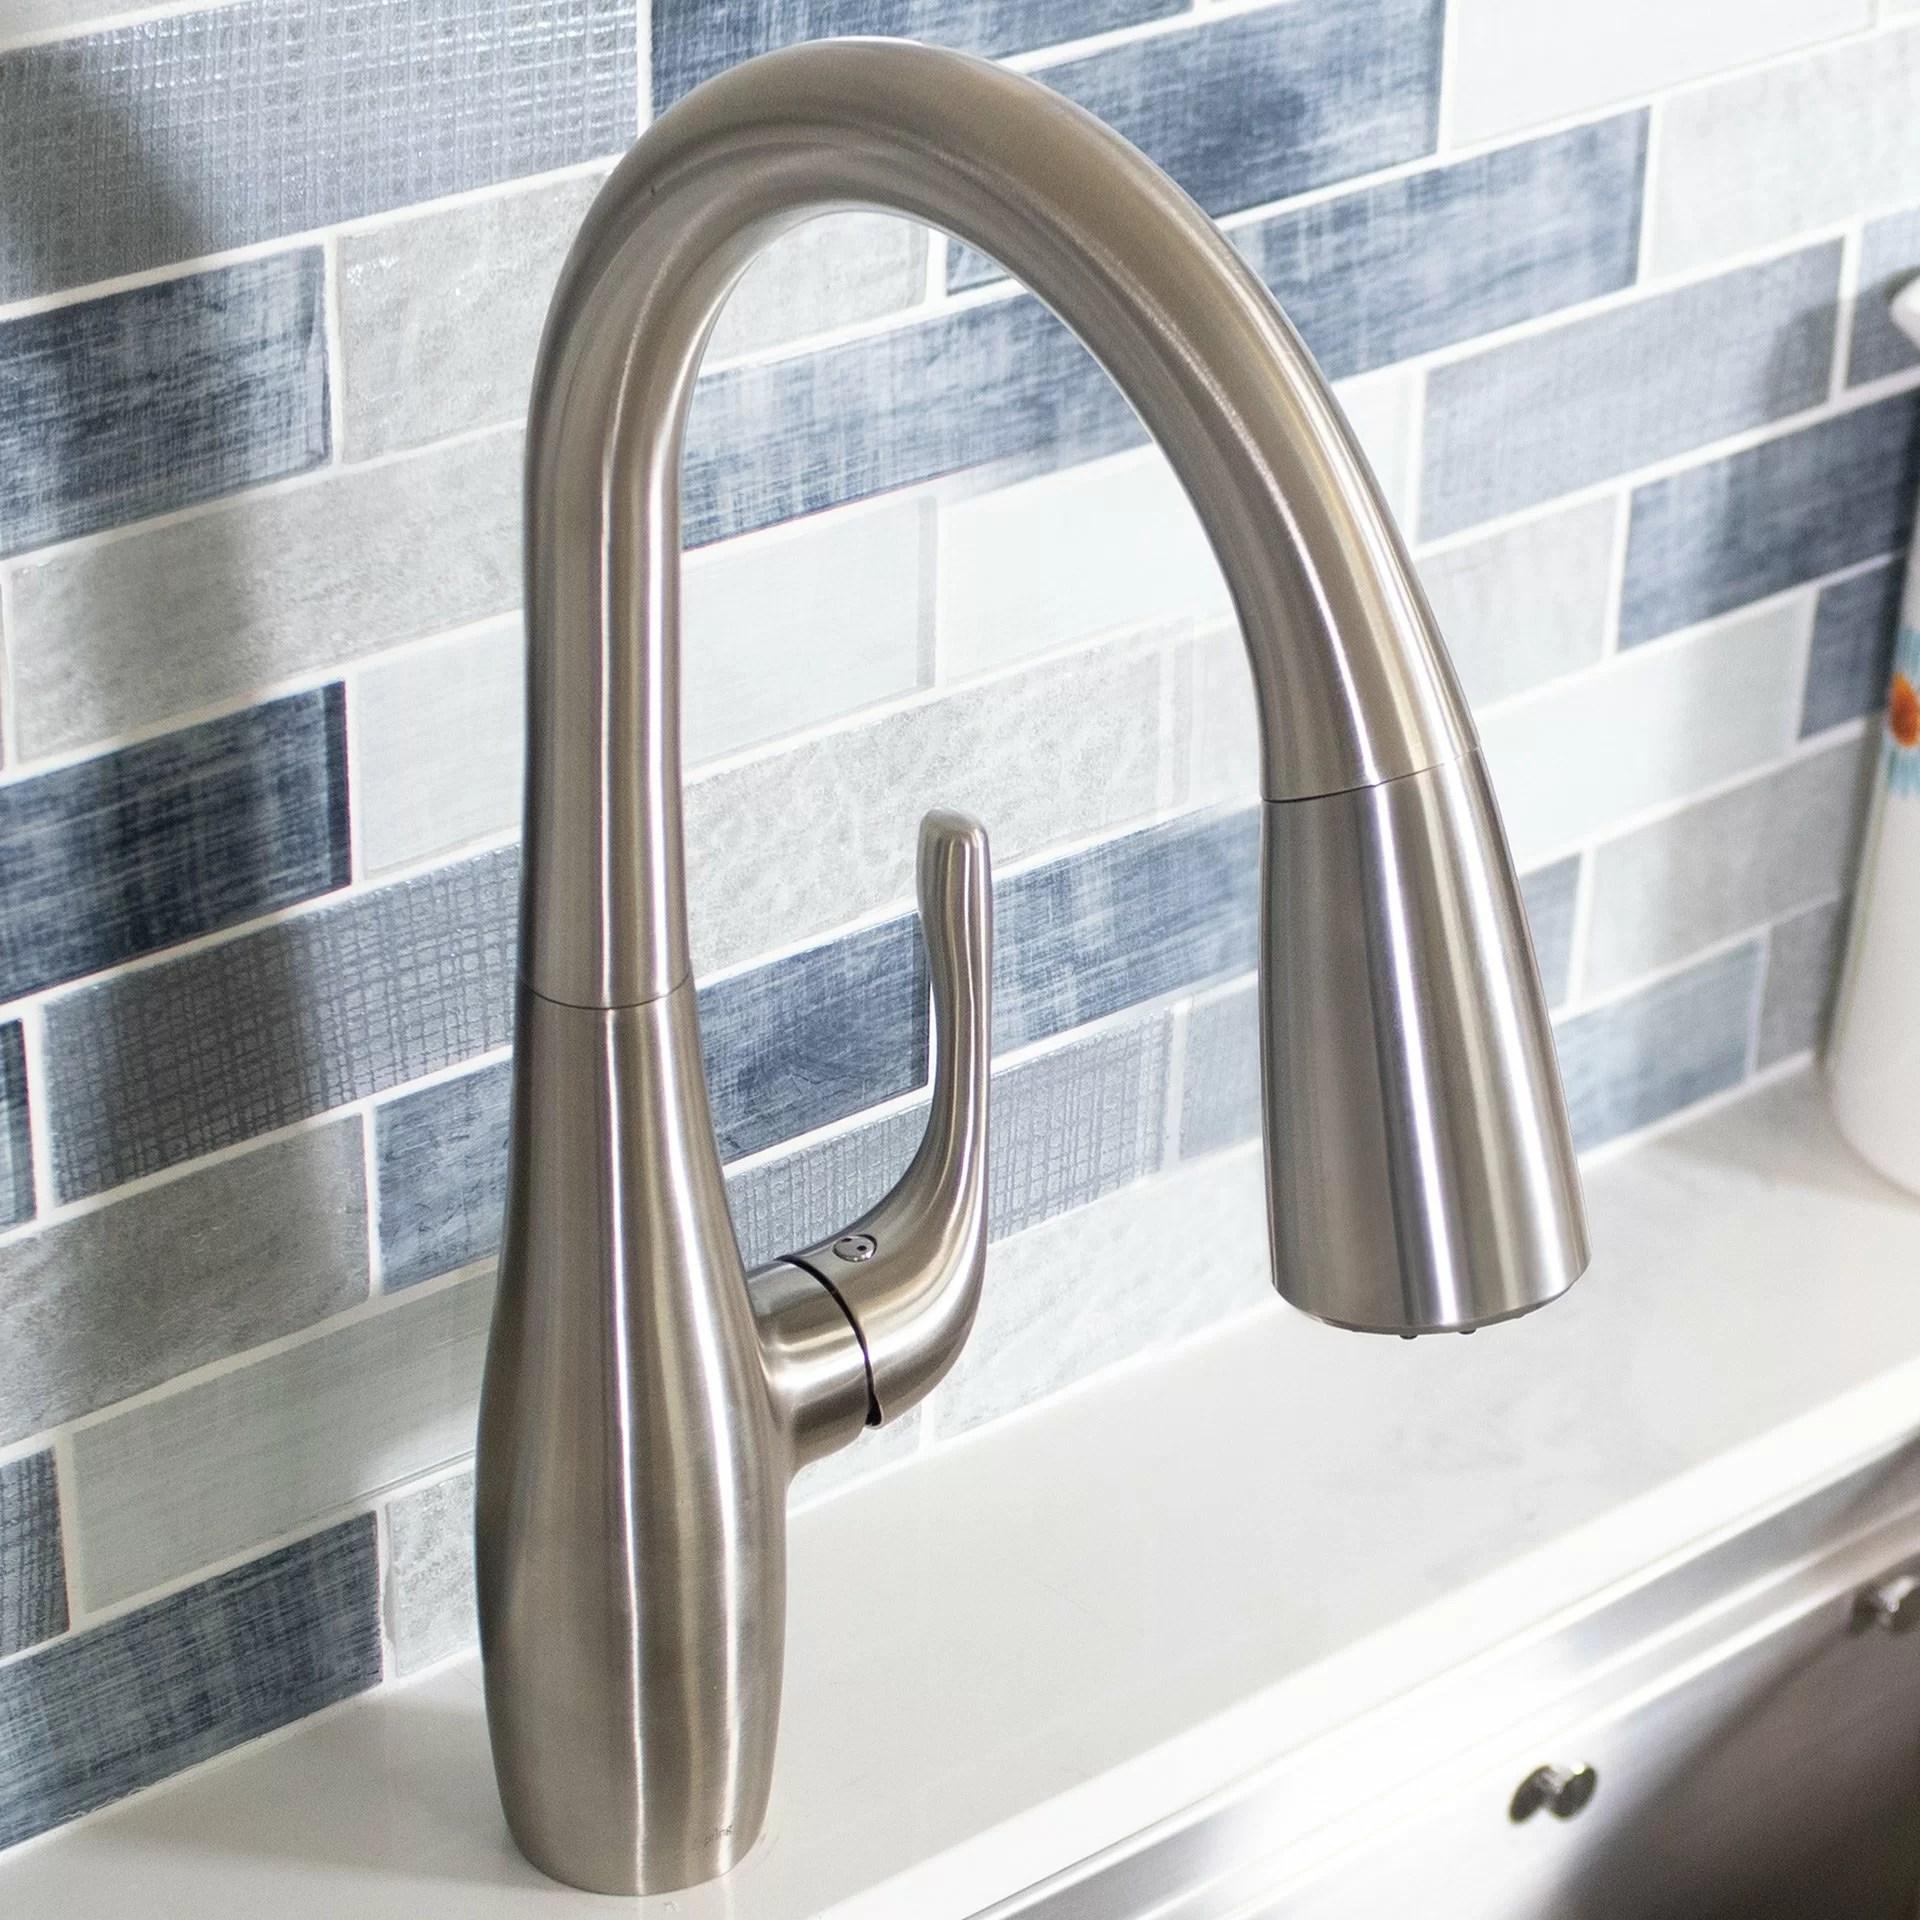 2 handle standard kitchen faucet side